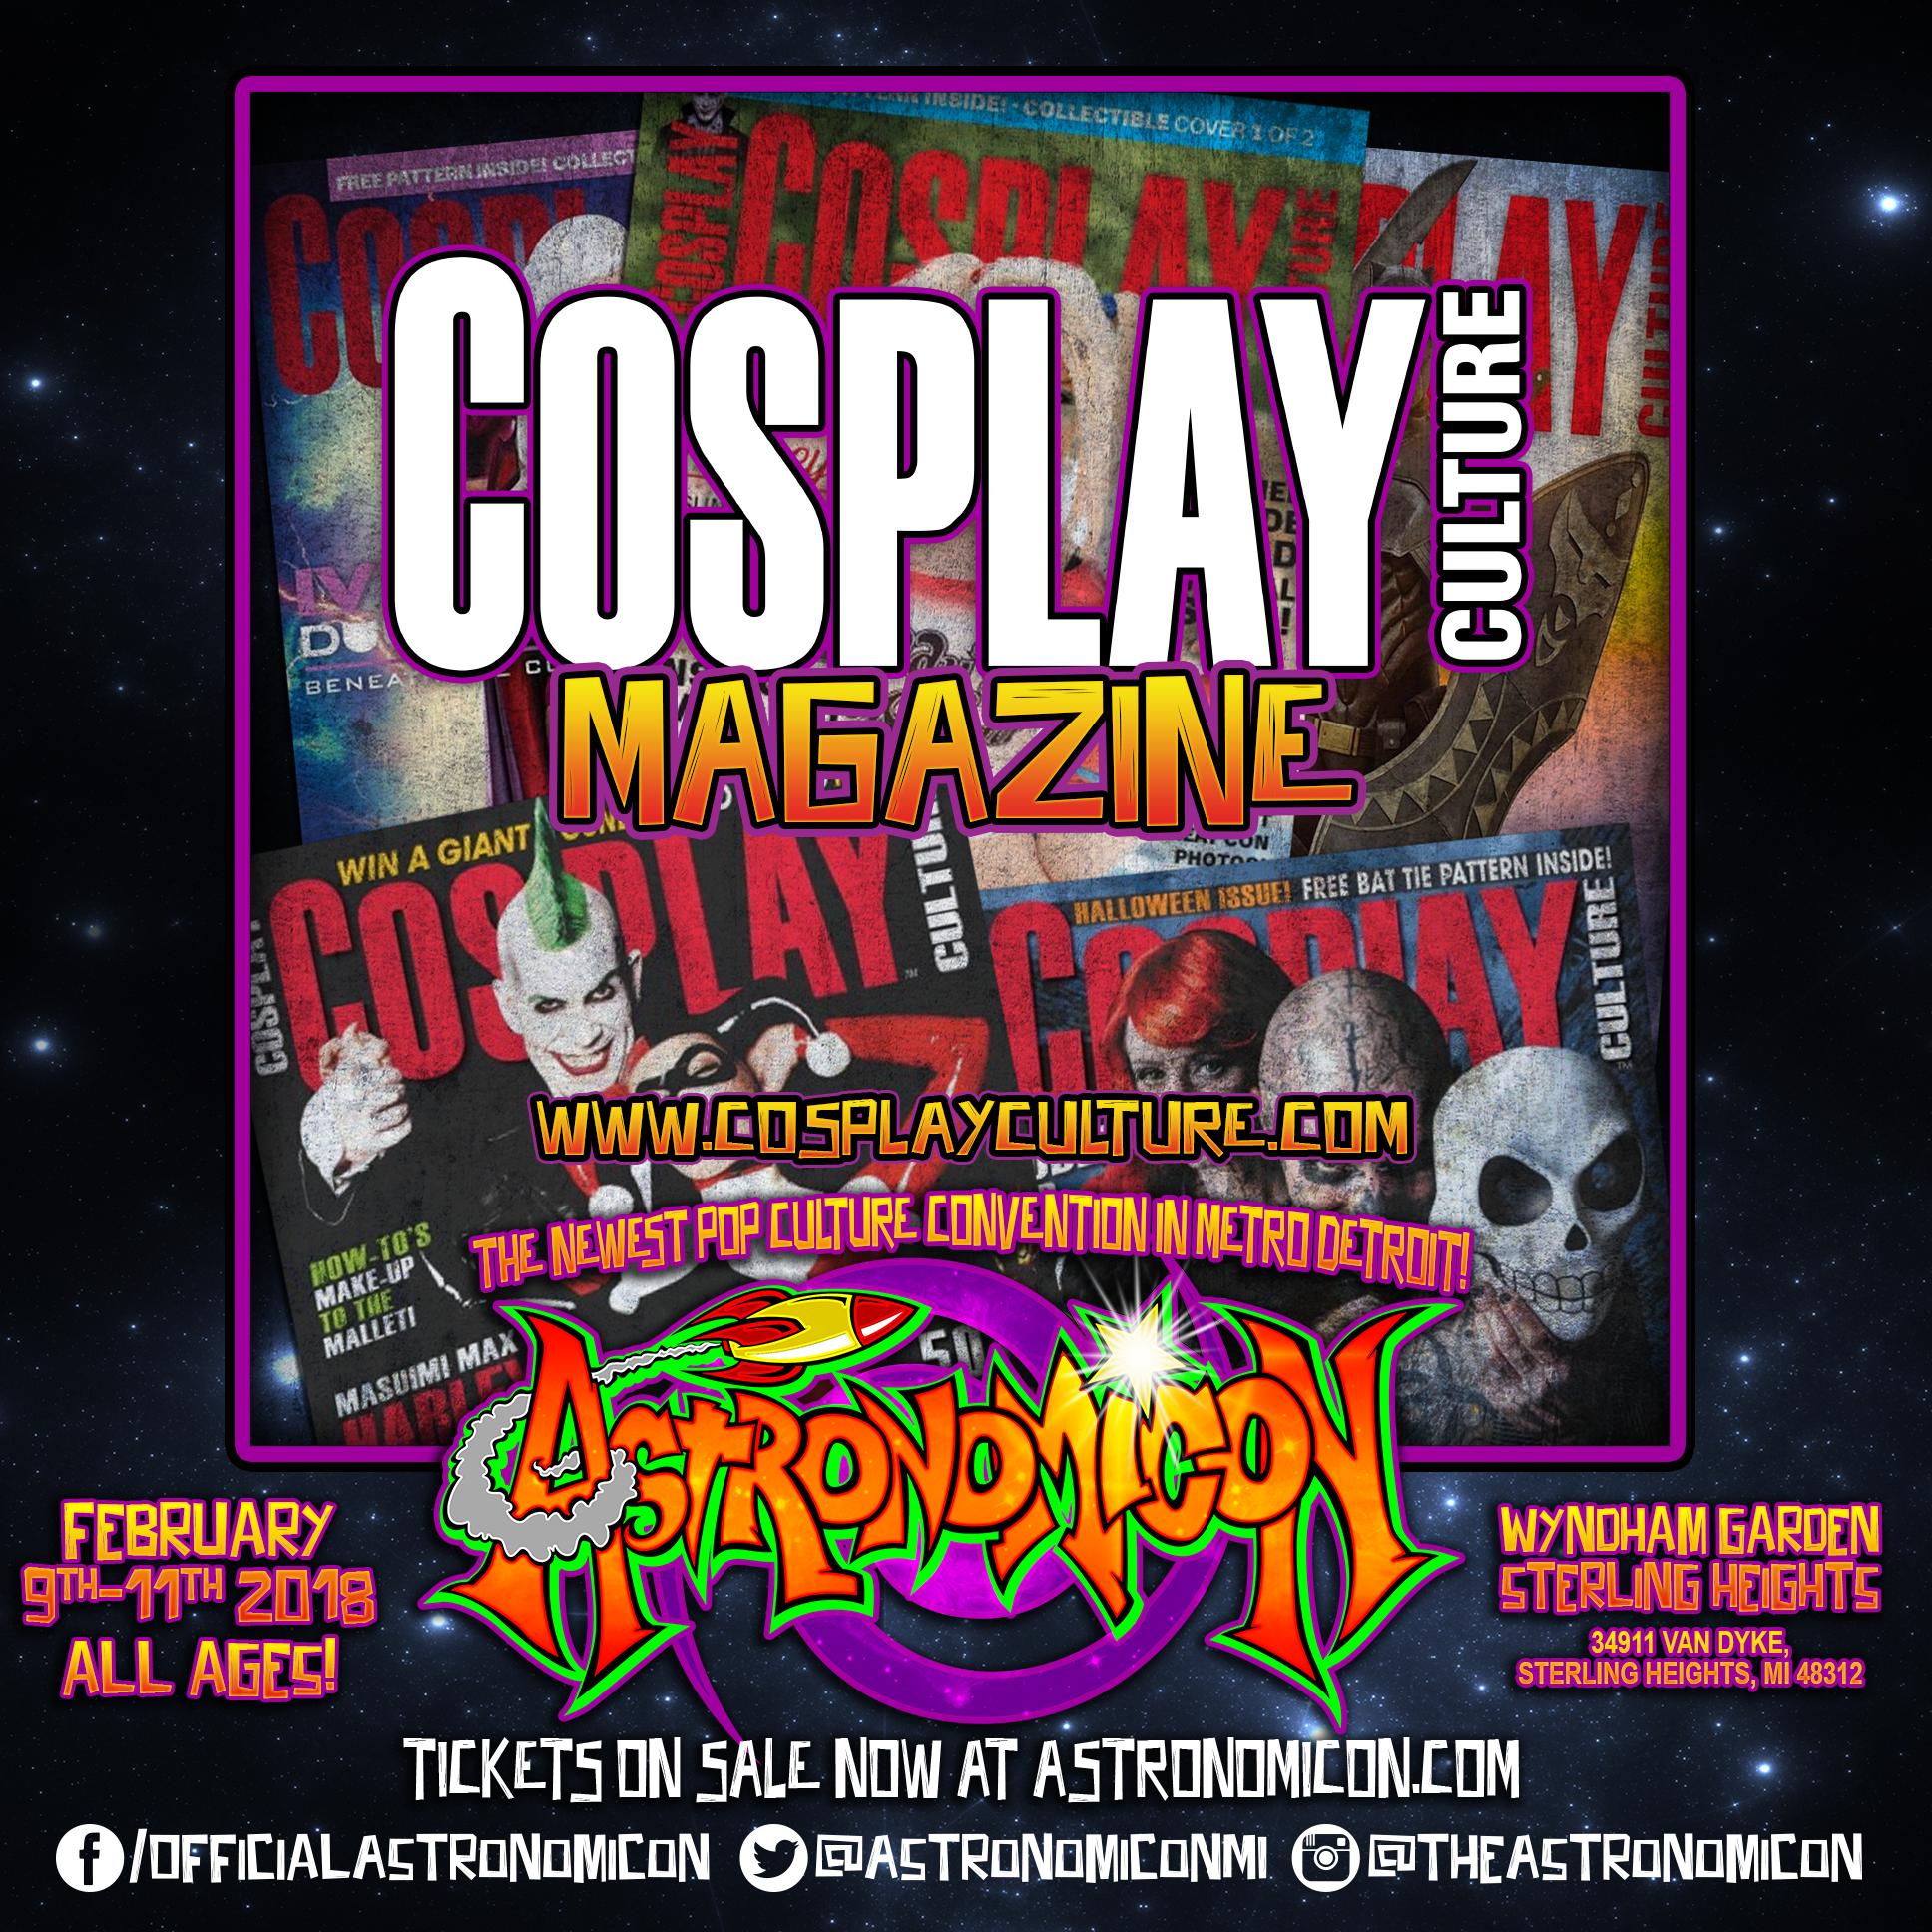 Cosplay Culture Magazine -  https://www.facebook.com/cosplayculturemagazine/